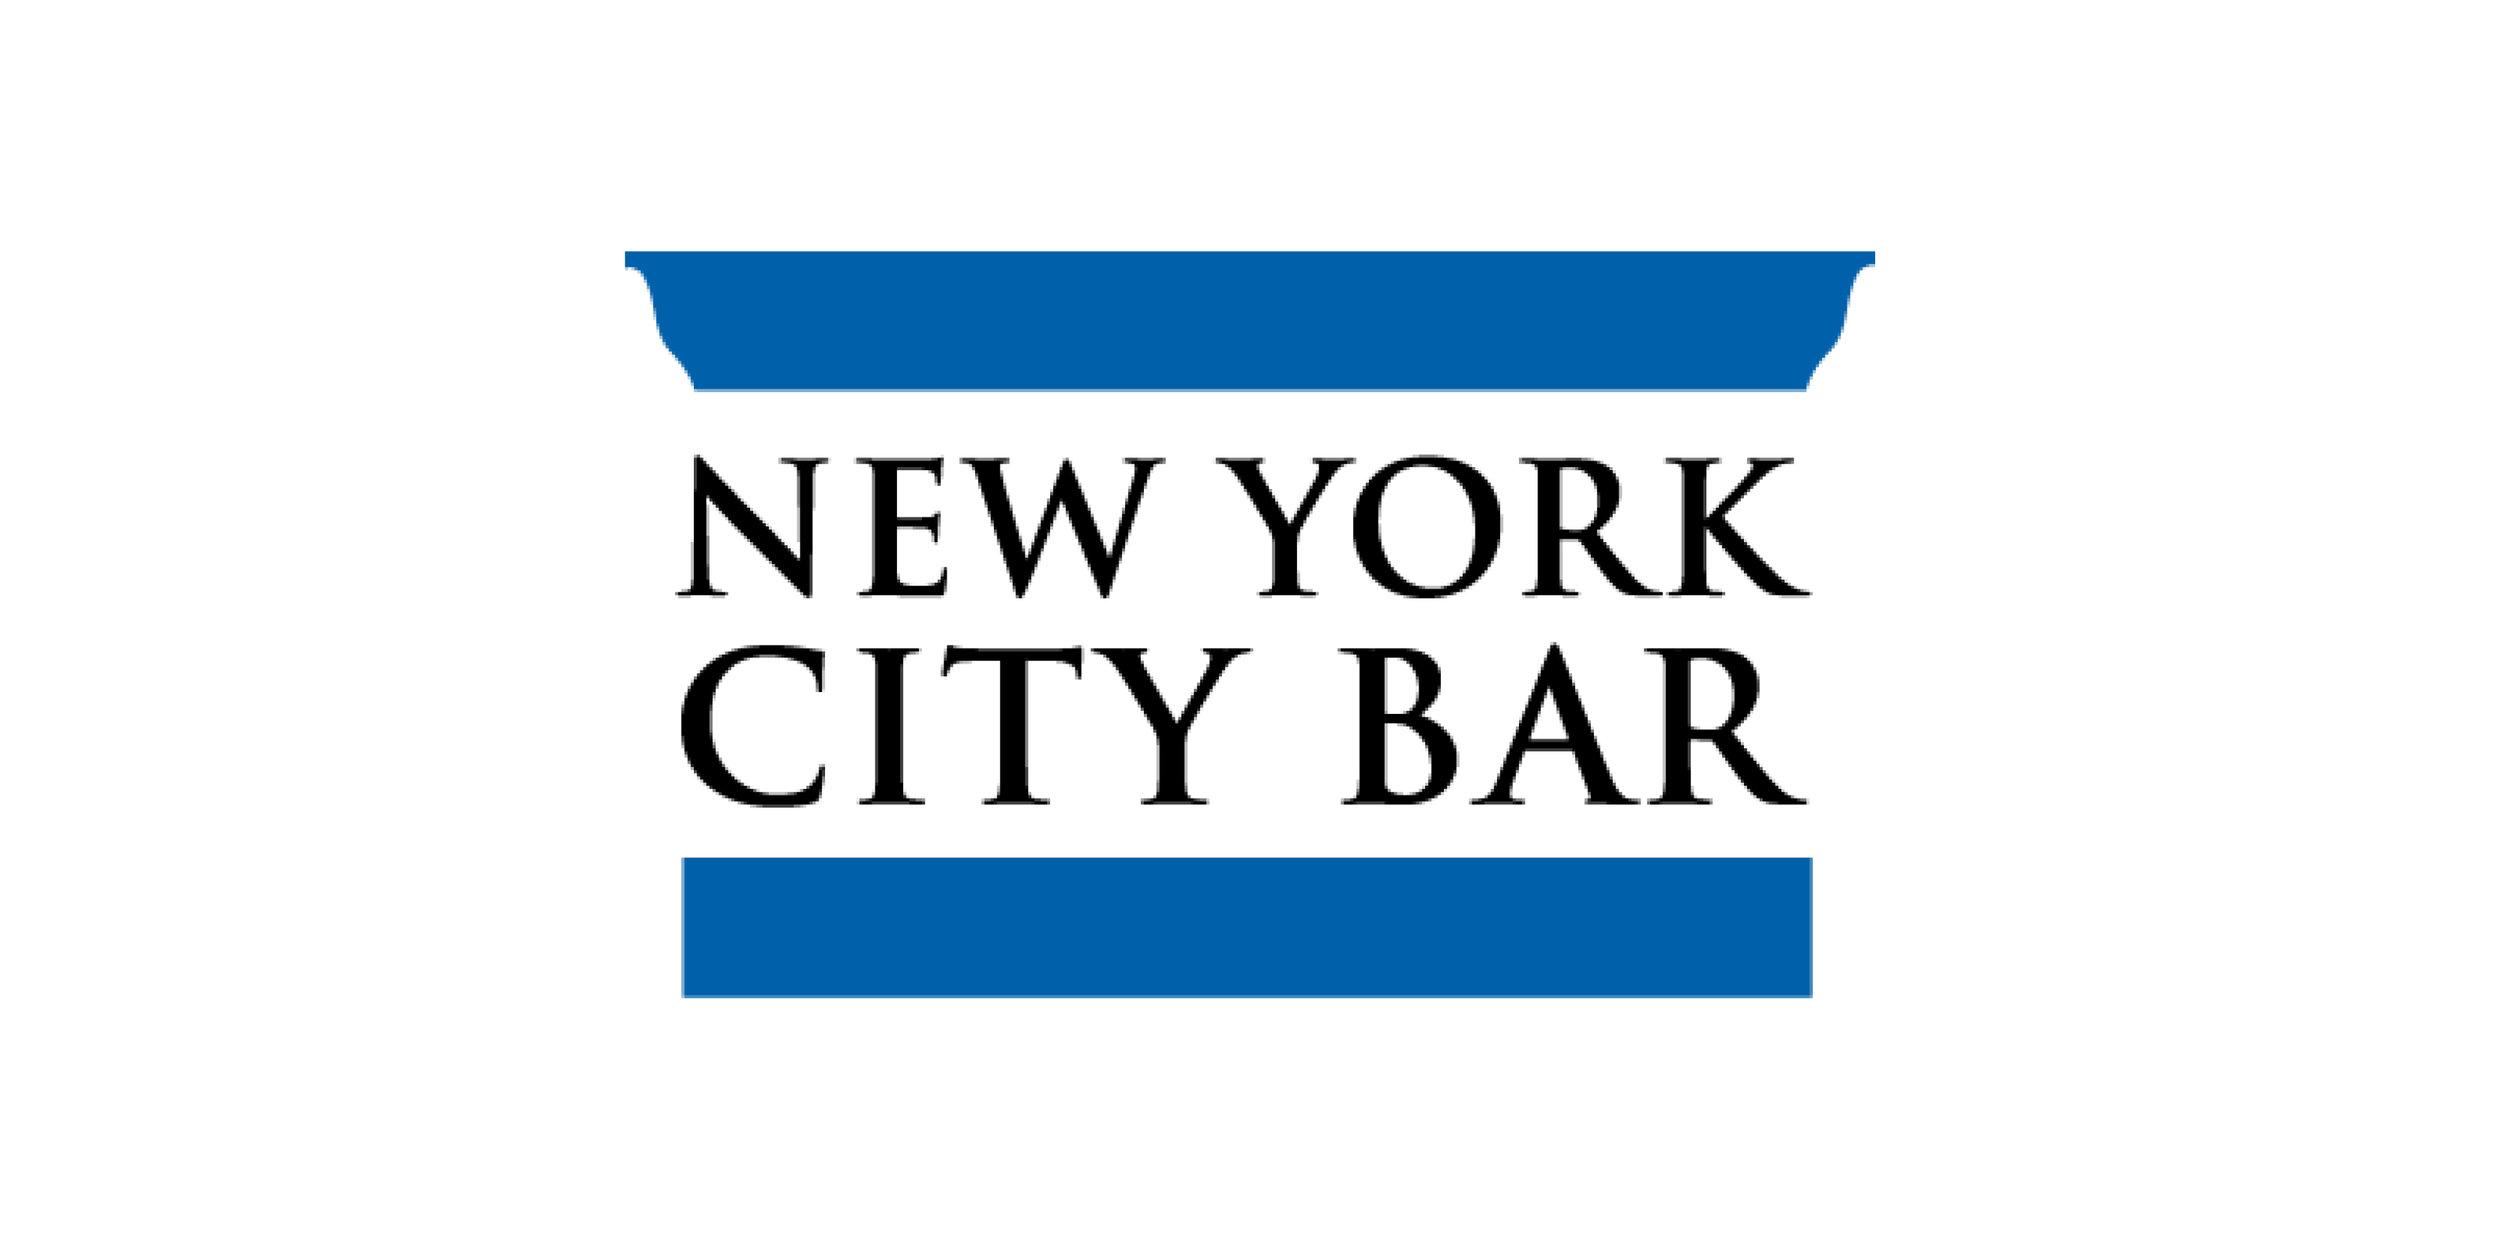 Law_Association_Logos8.jpg